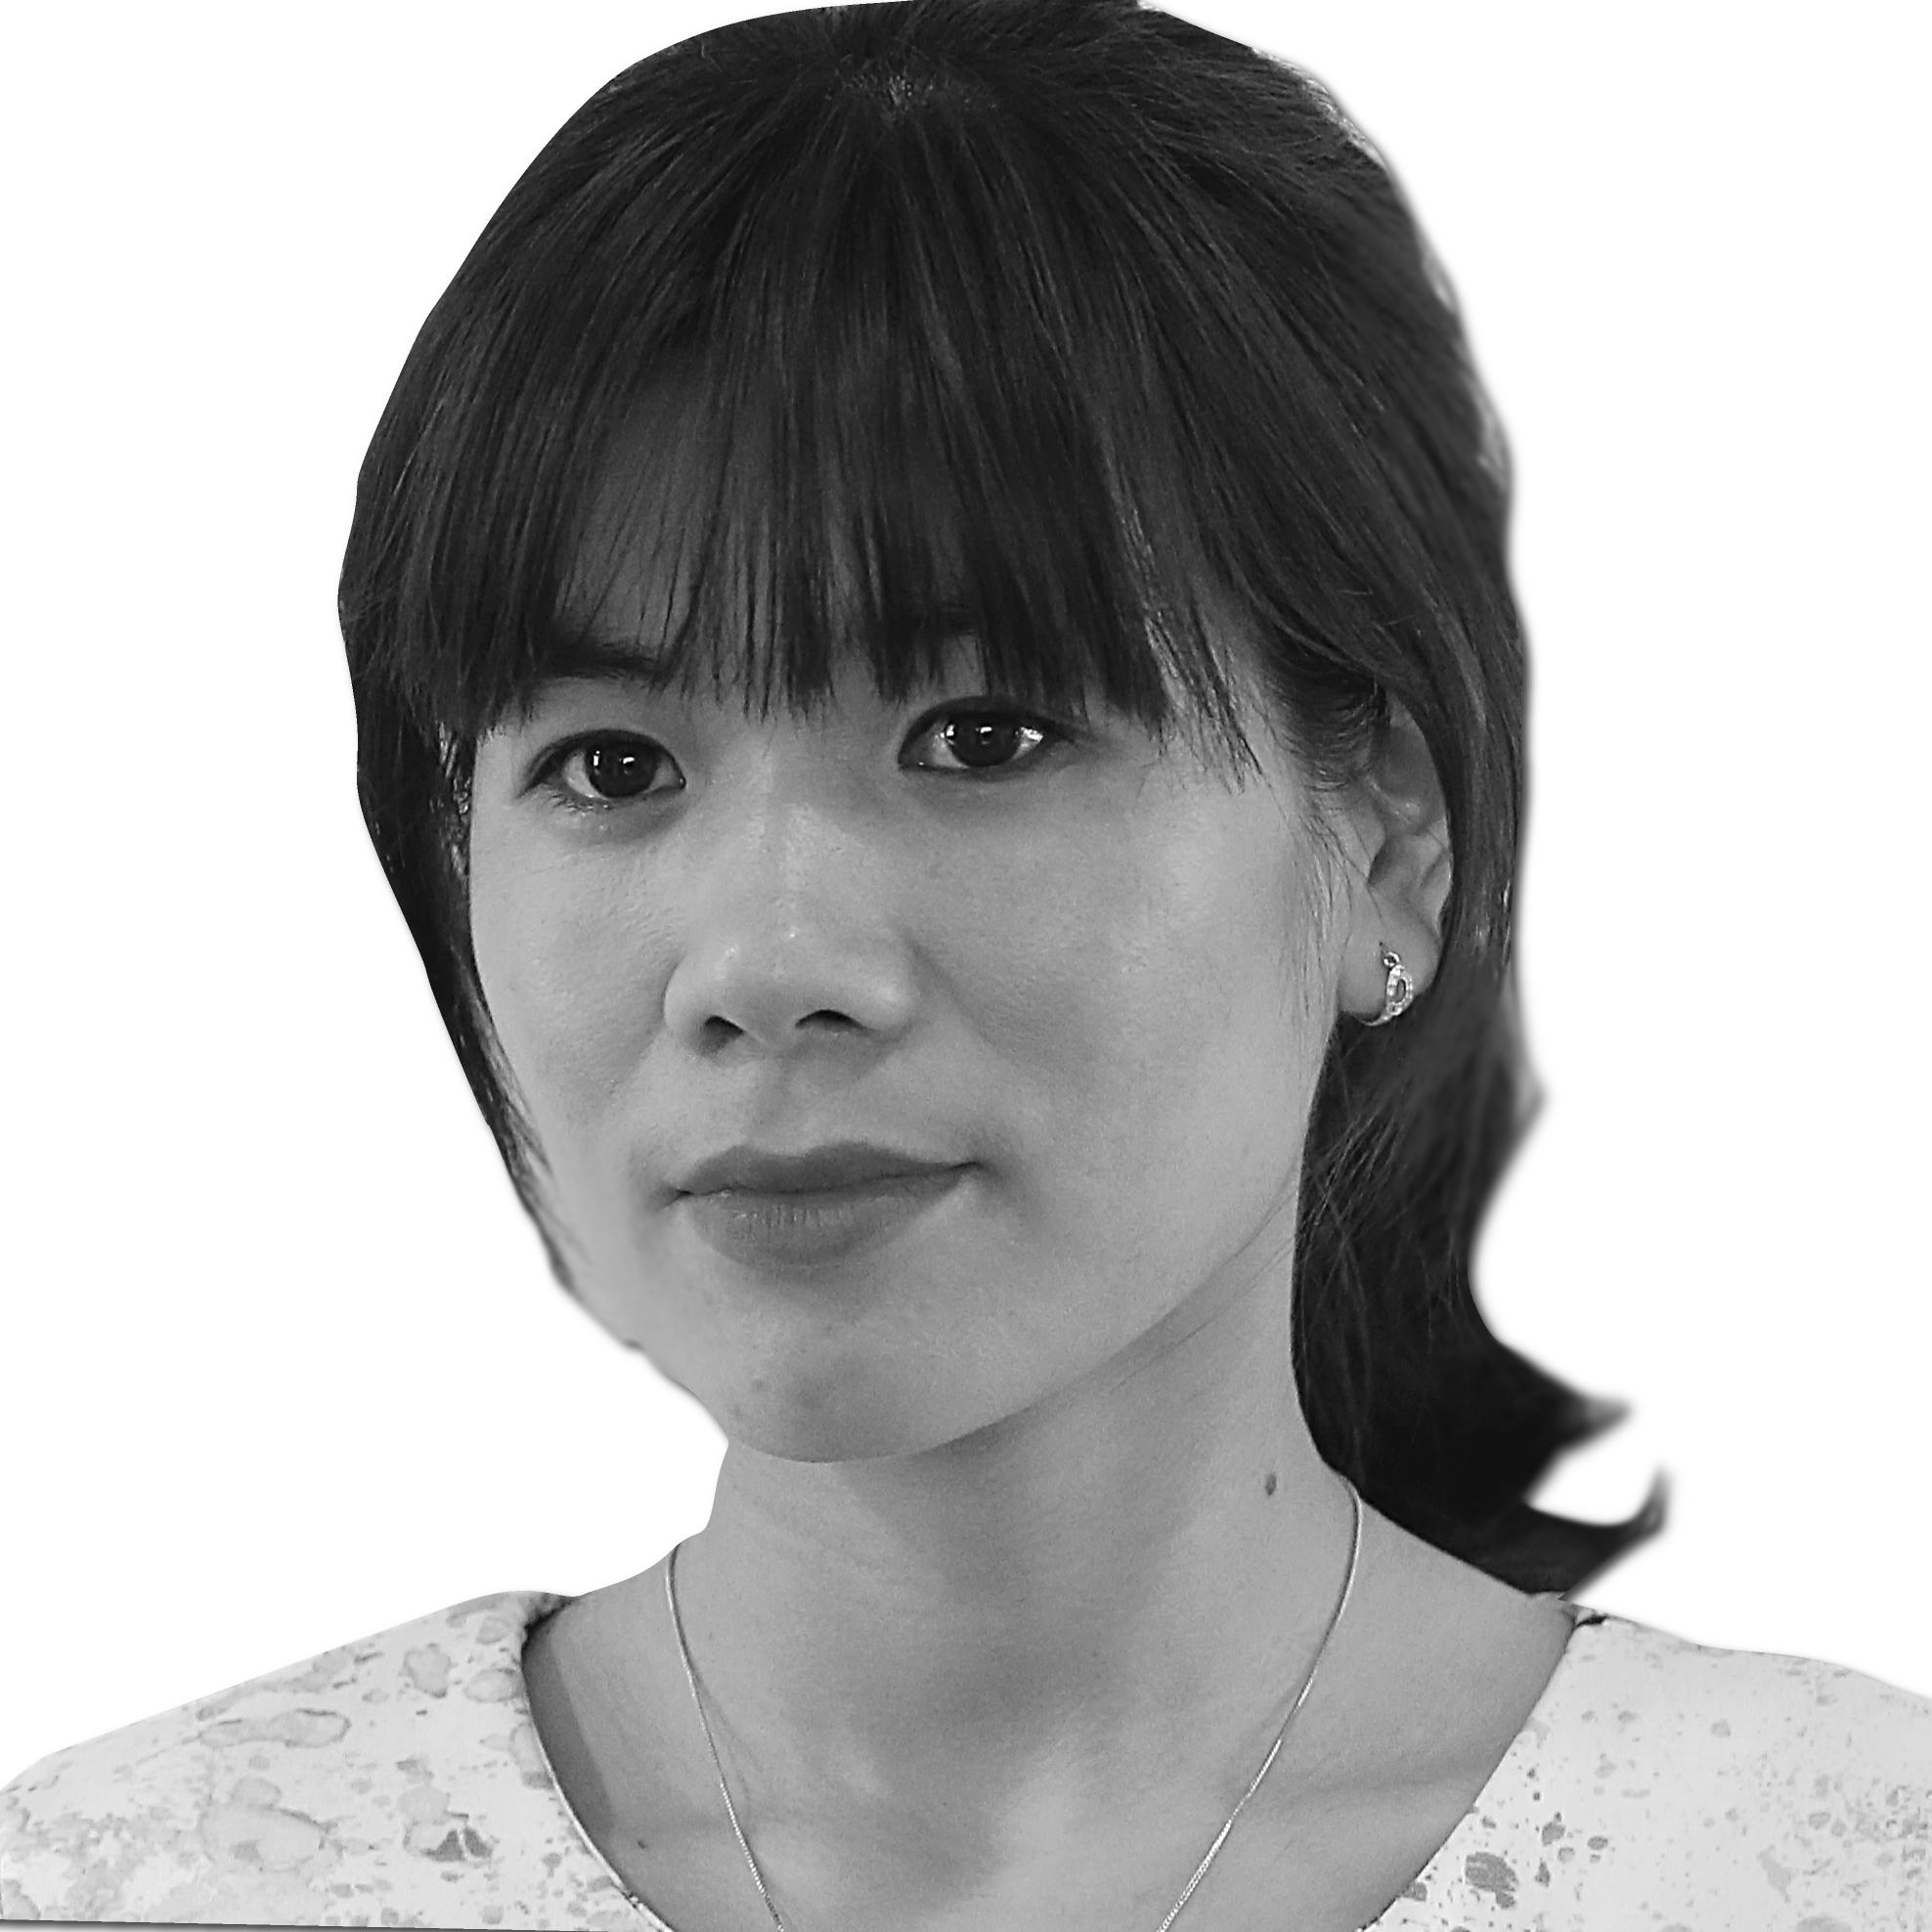 Phan Dương